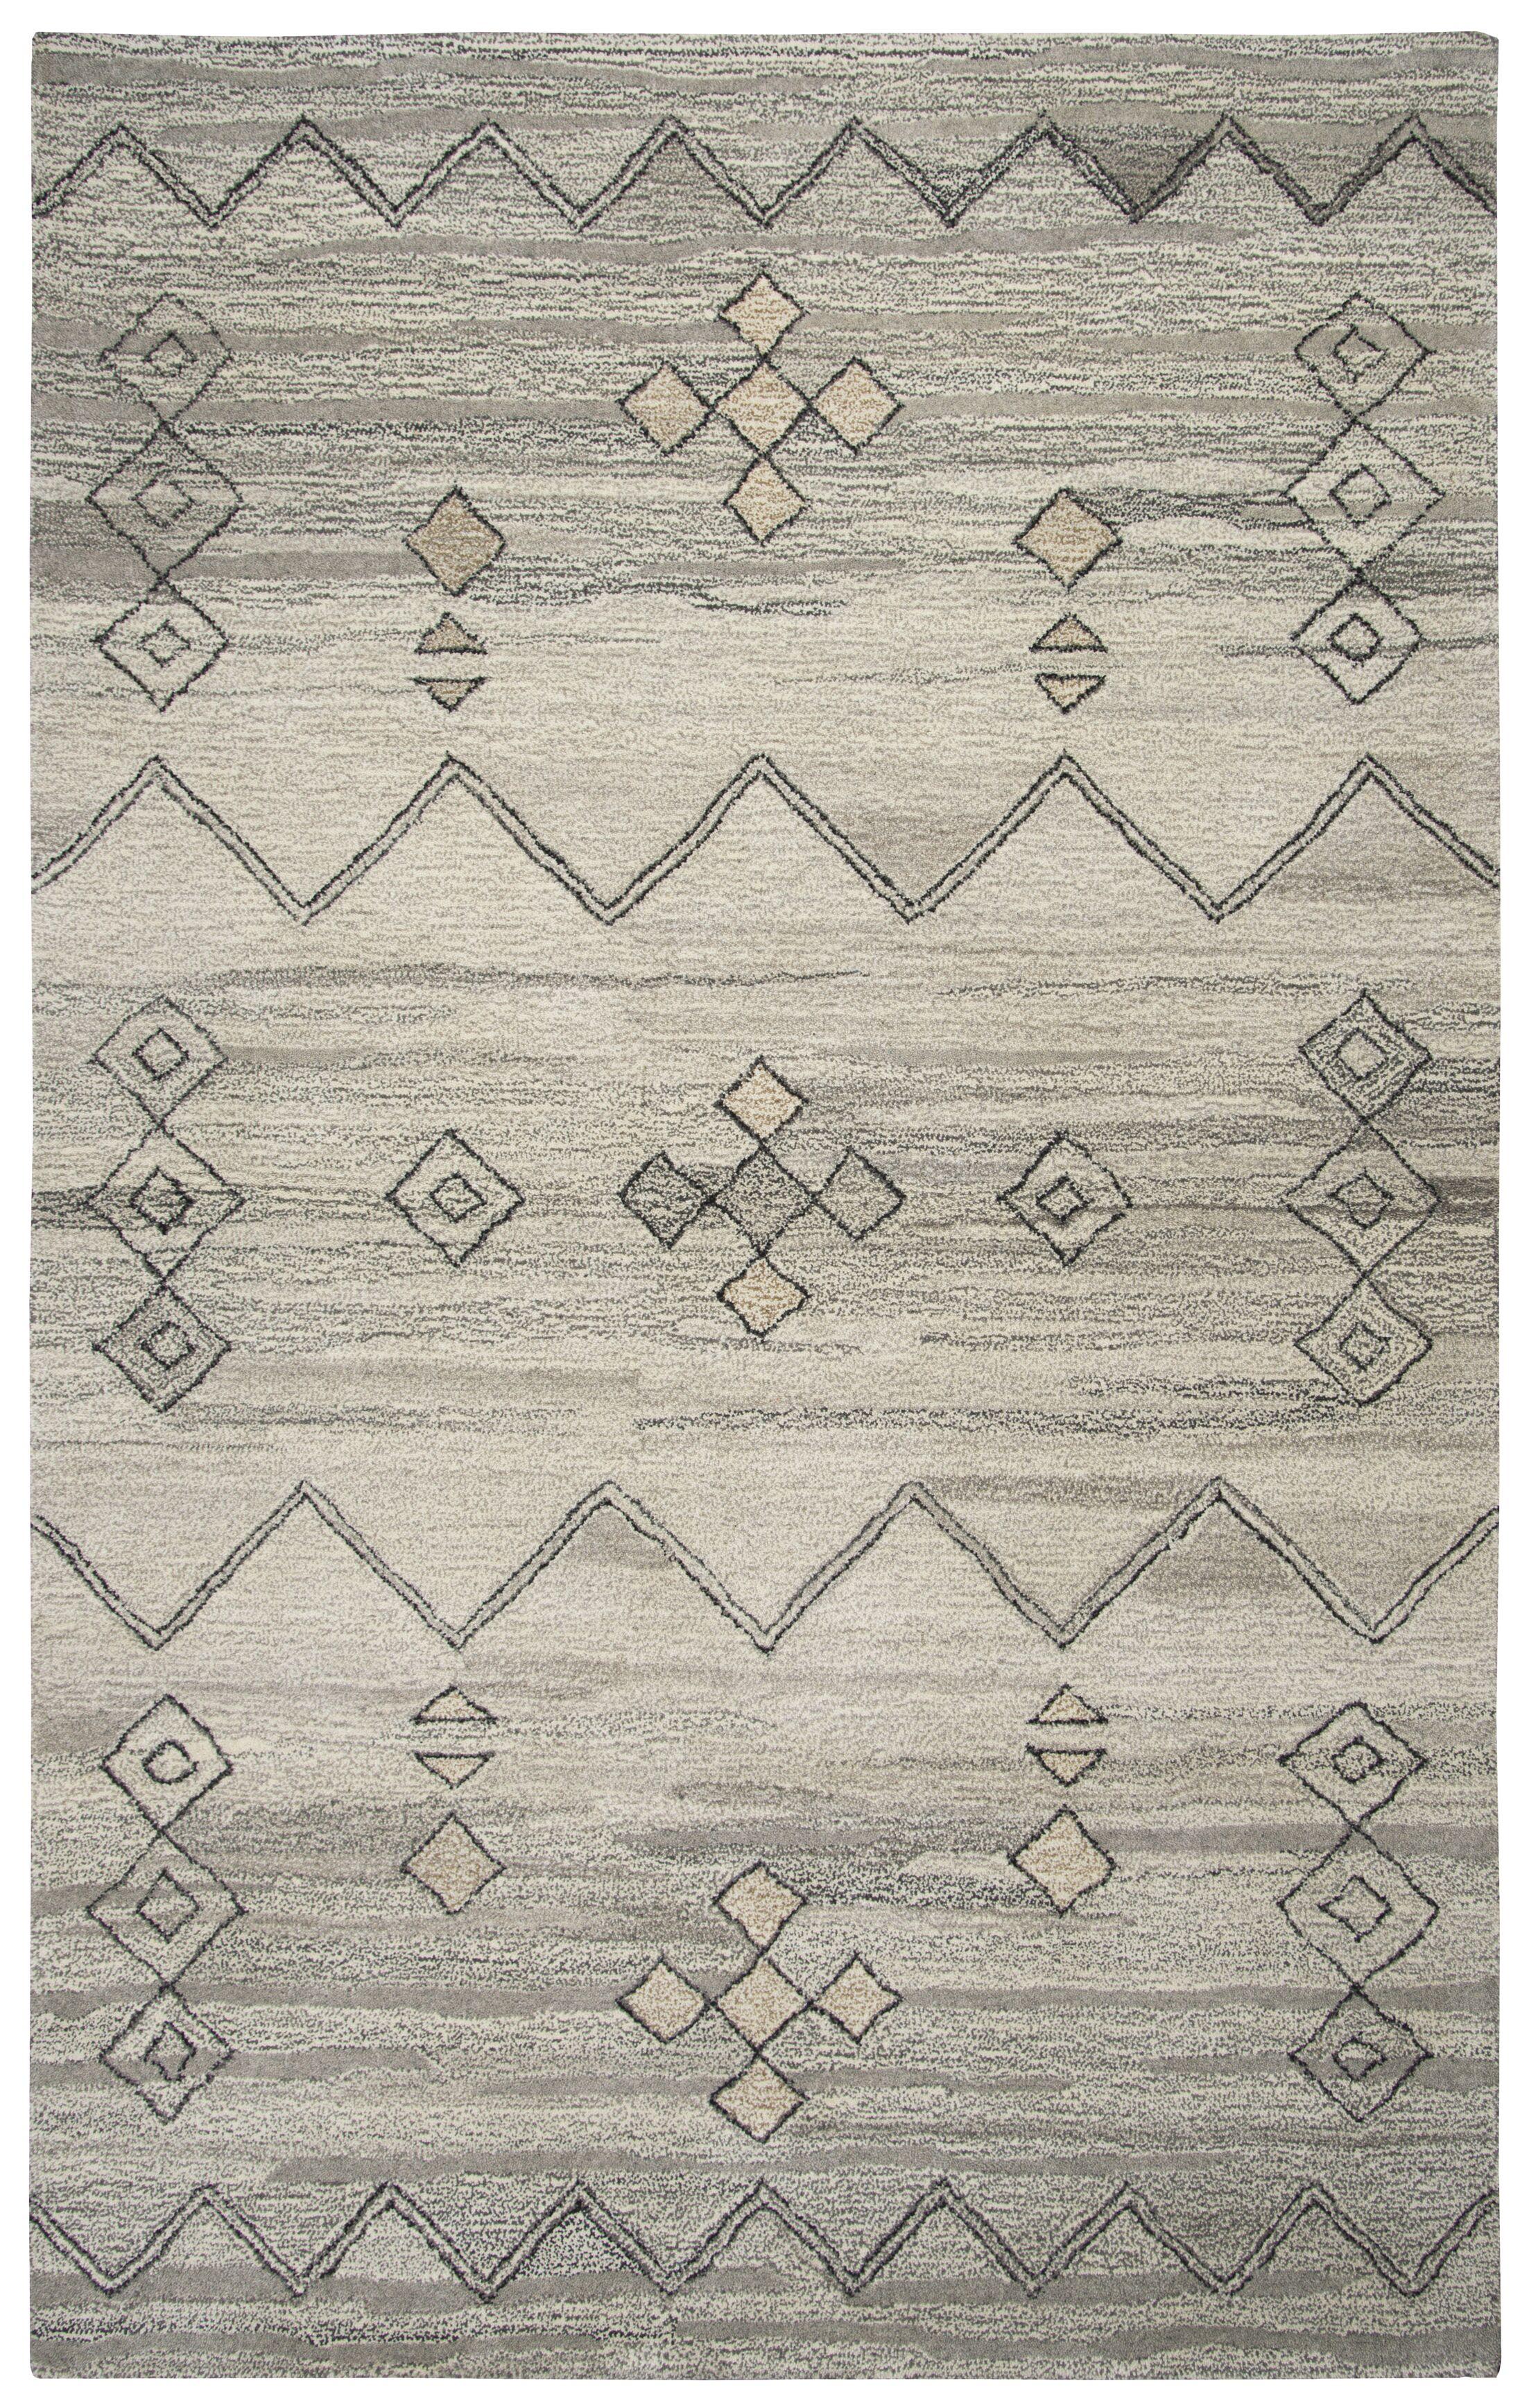 Bowdoin Hand-Tufted Gray Area Rug Rug Size: Rectangle 10' x 13'